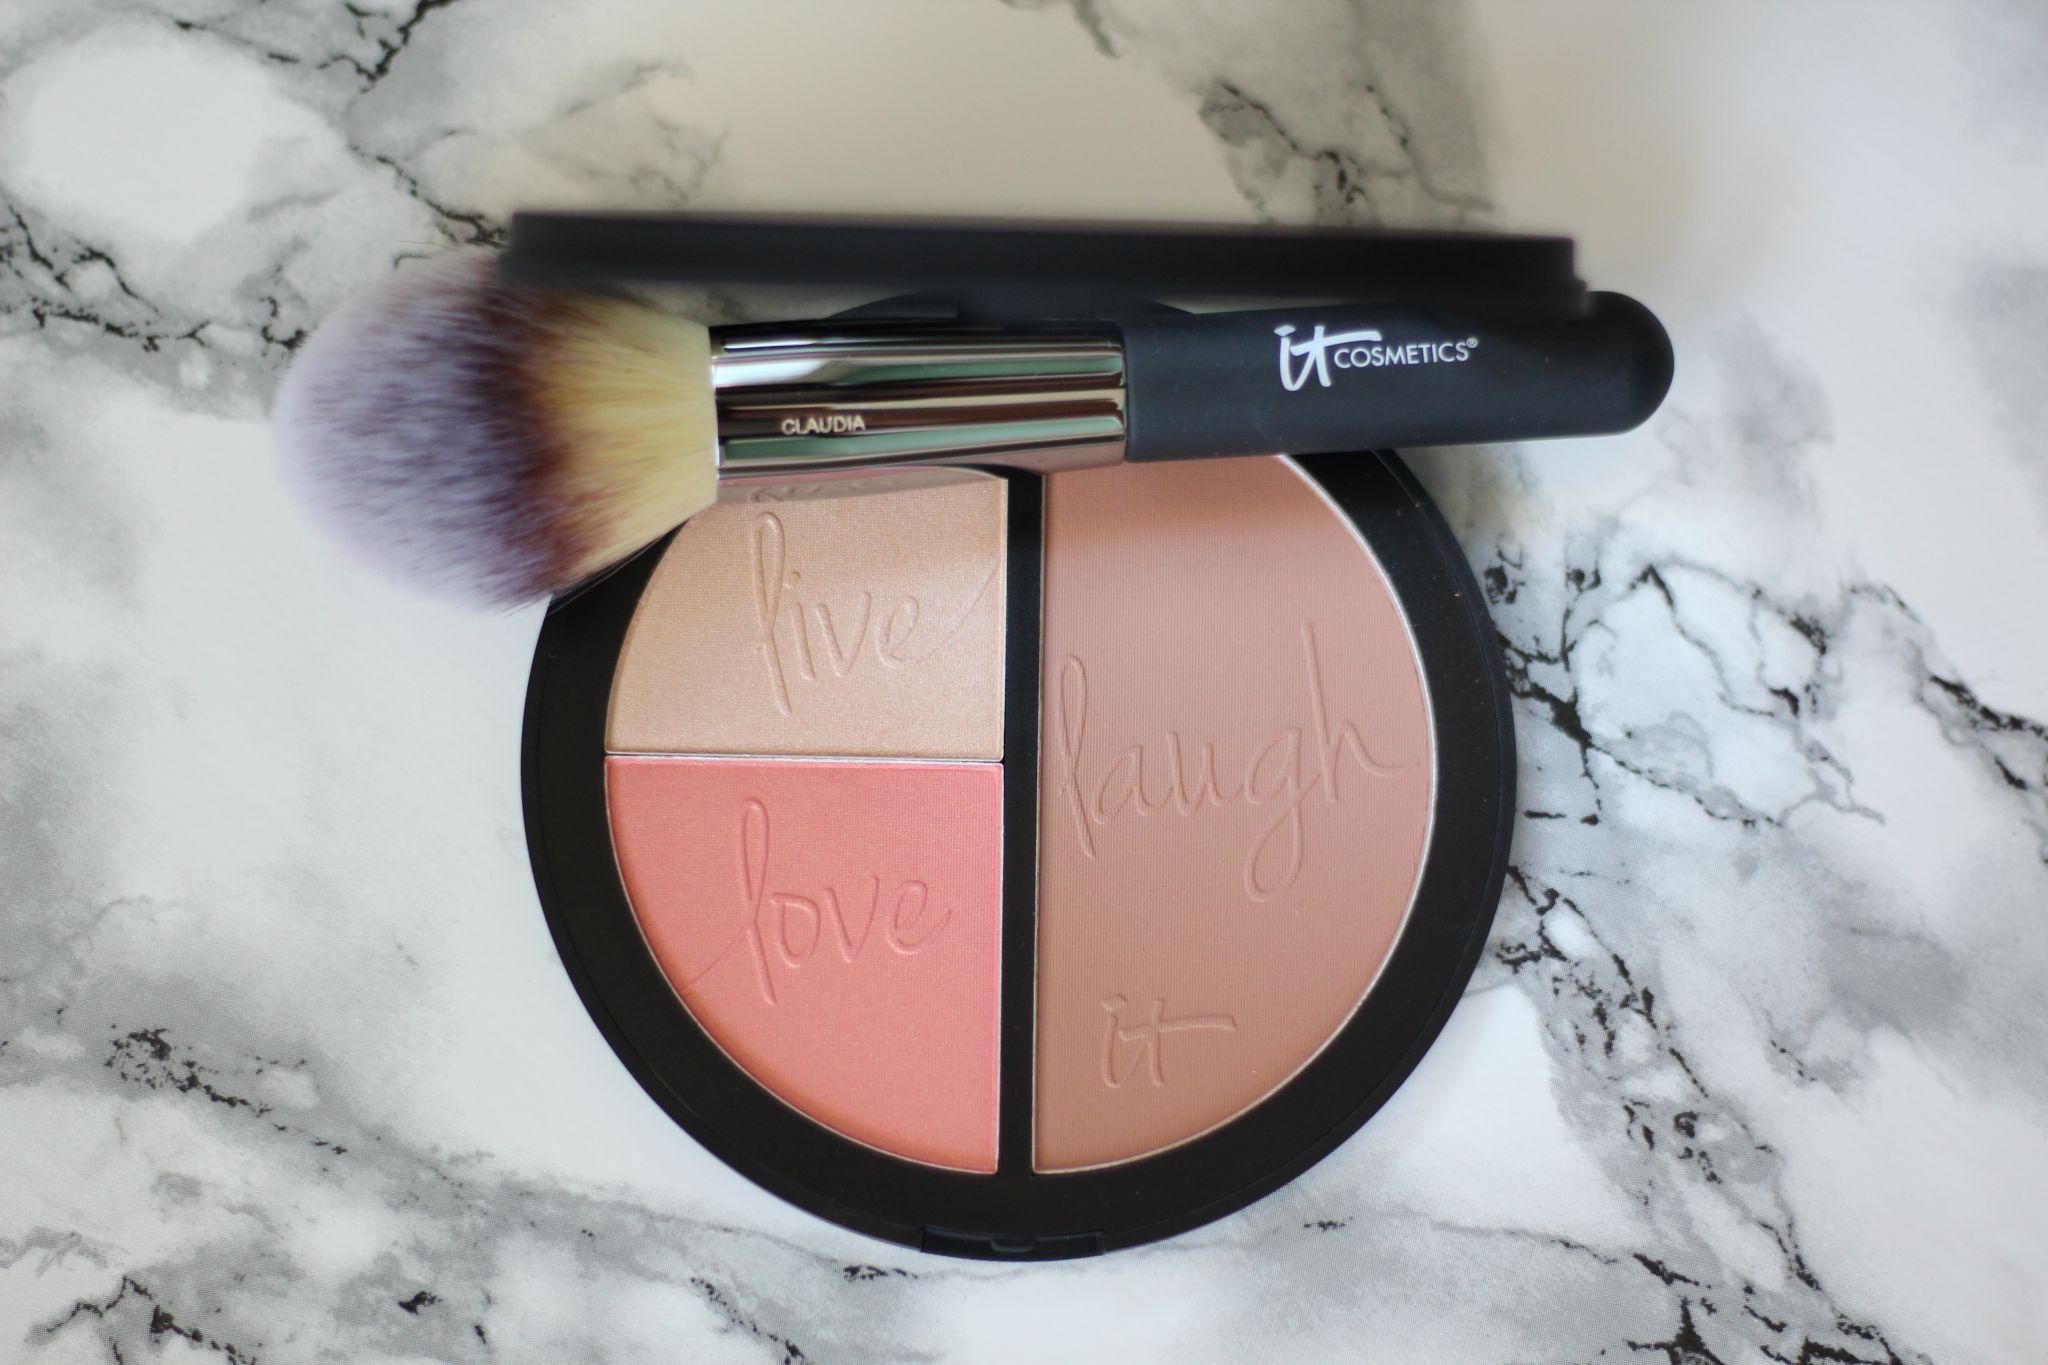 glamupyourlifestyle it-cosmetics itcosmetics cc-creme concealer douglas Kosmetikmarke hyperpigmentierung Rosacea Make-up